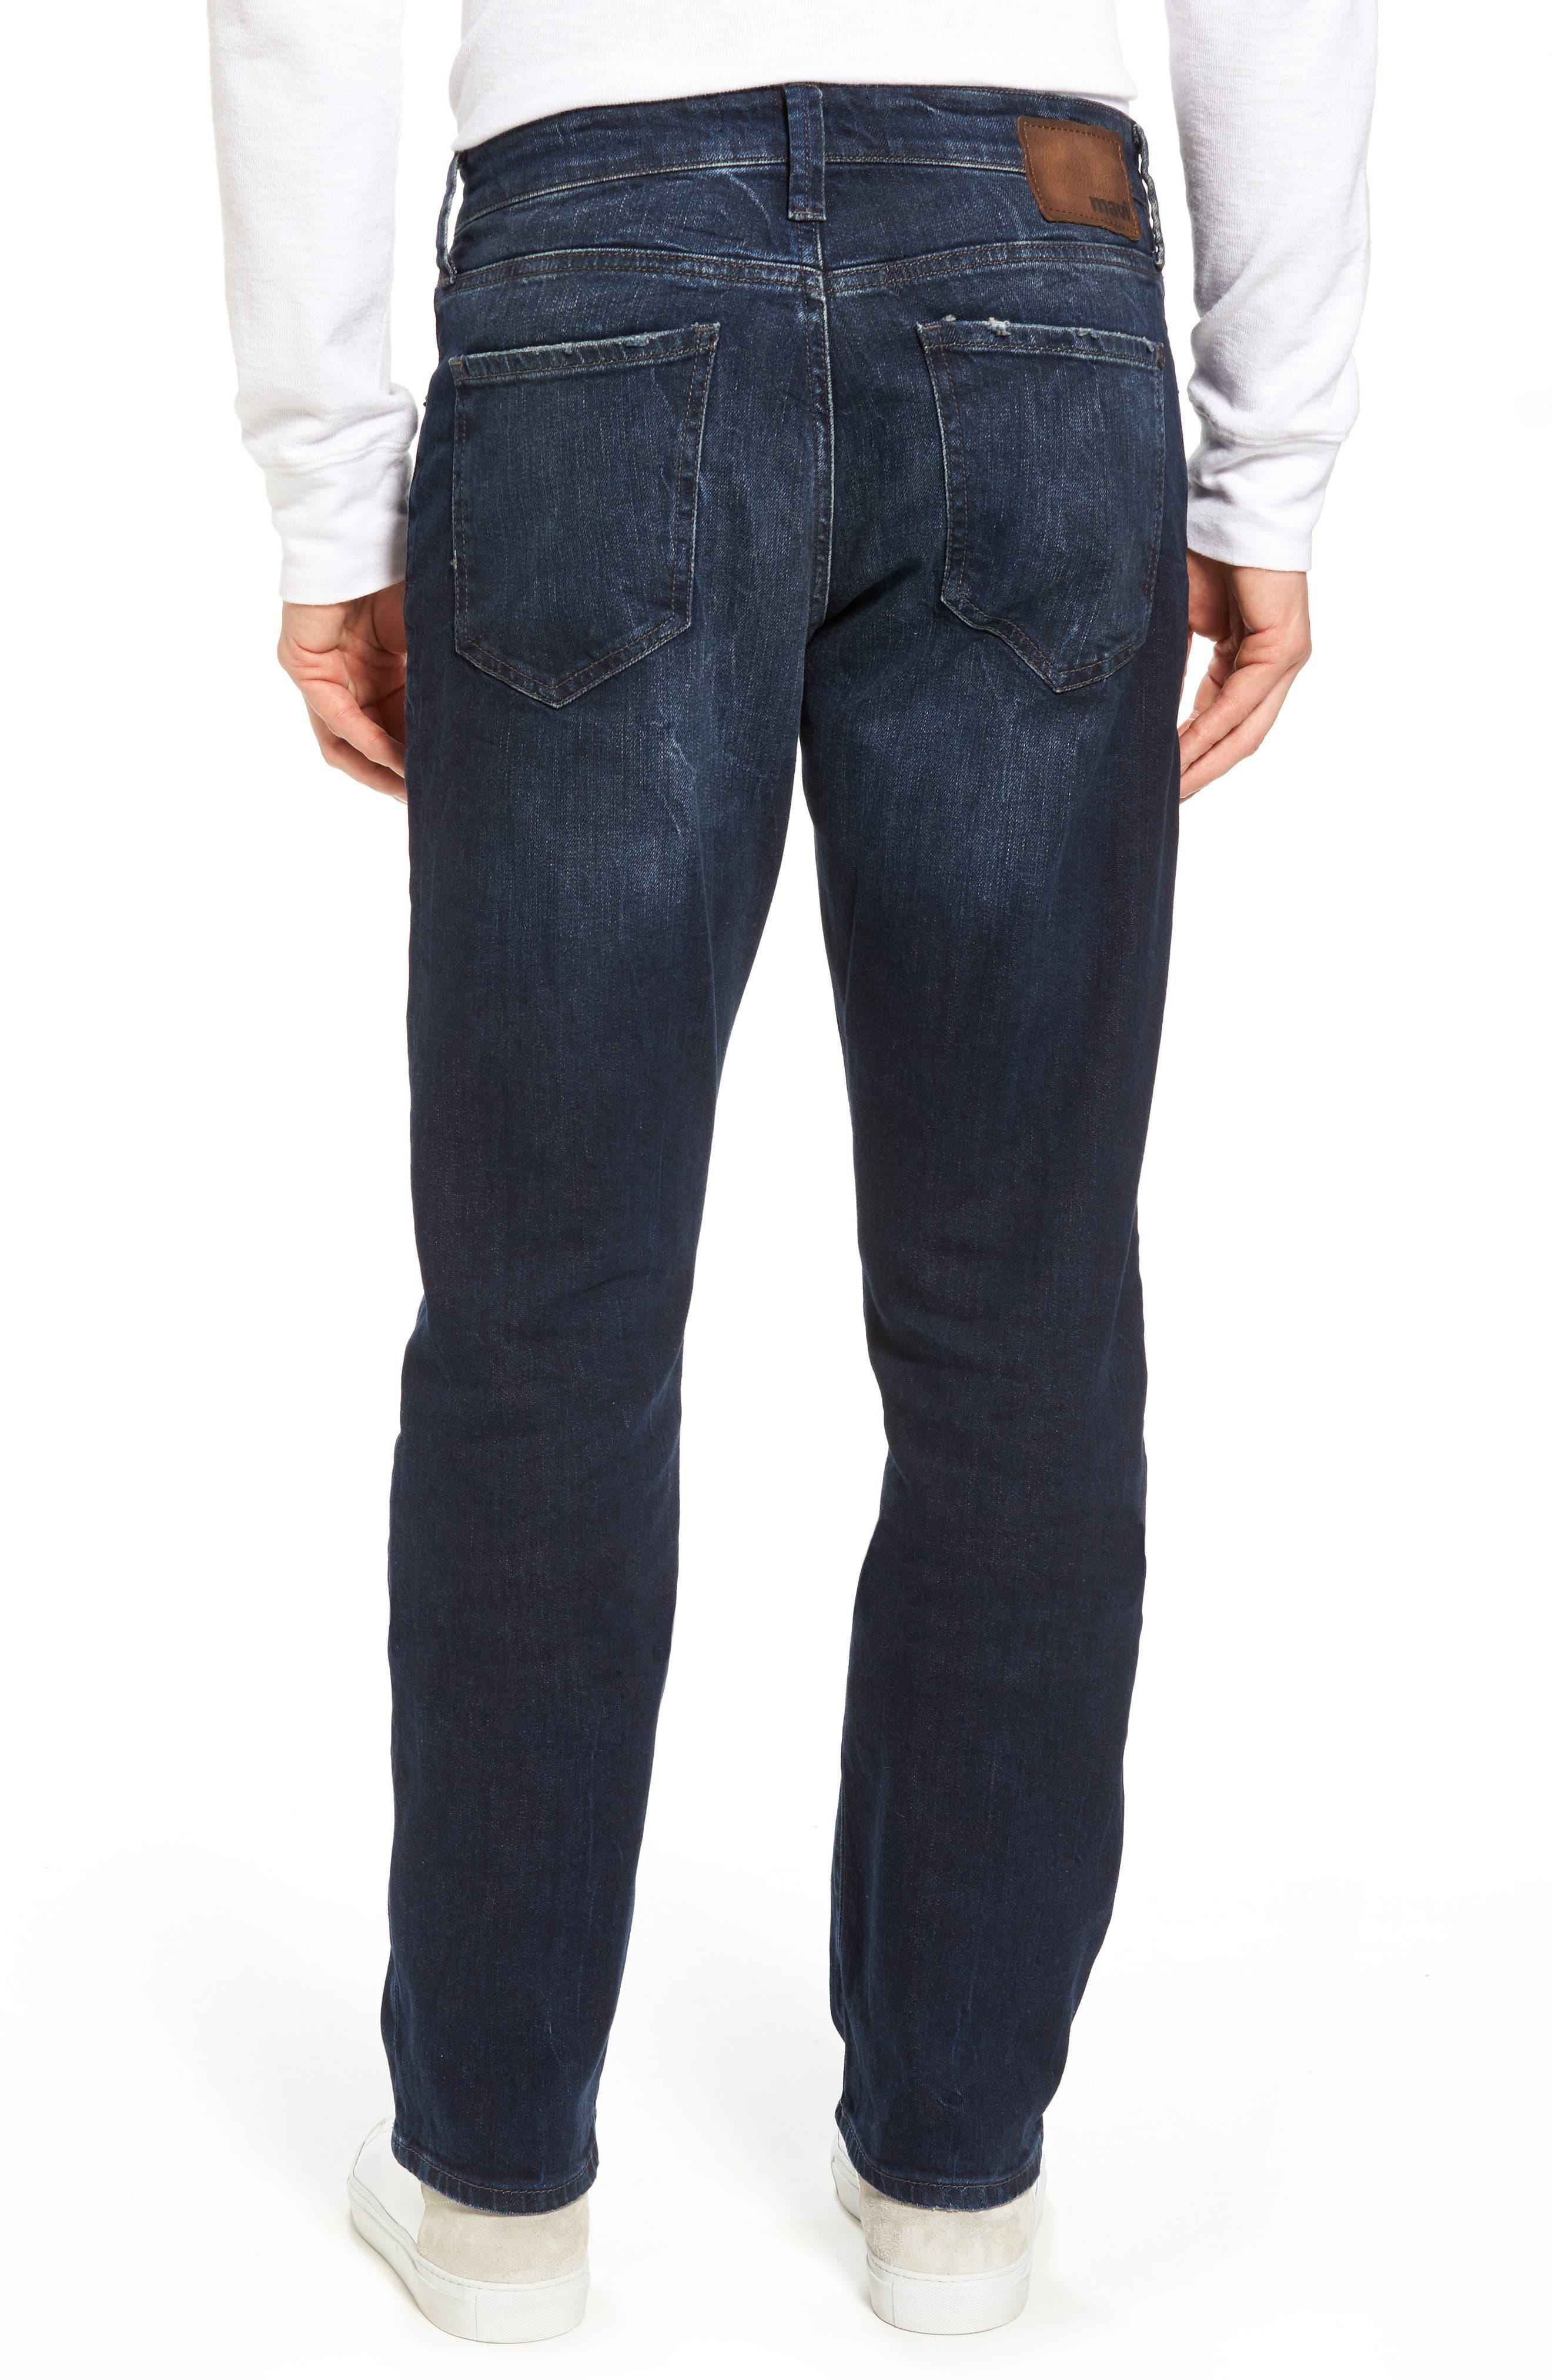 MAVI JEANS,                             Myles Straight Leg Jeans,                             Alternate thumbnail 2, color,                             401